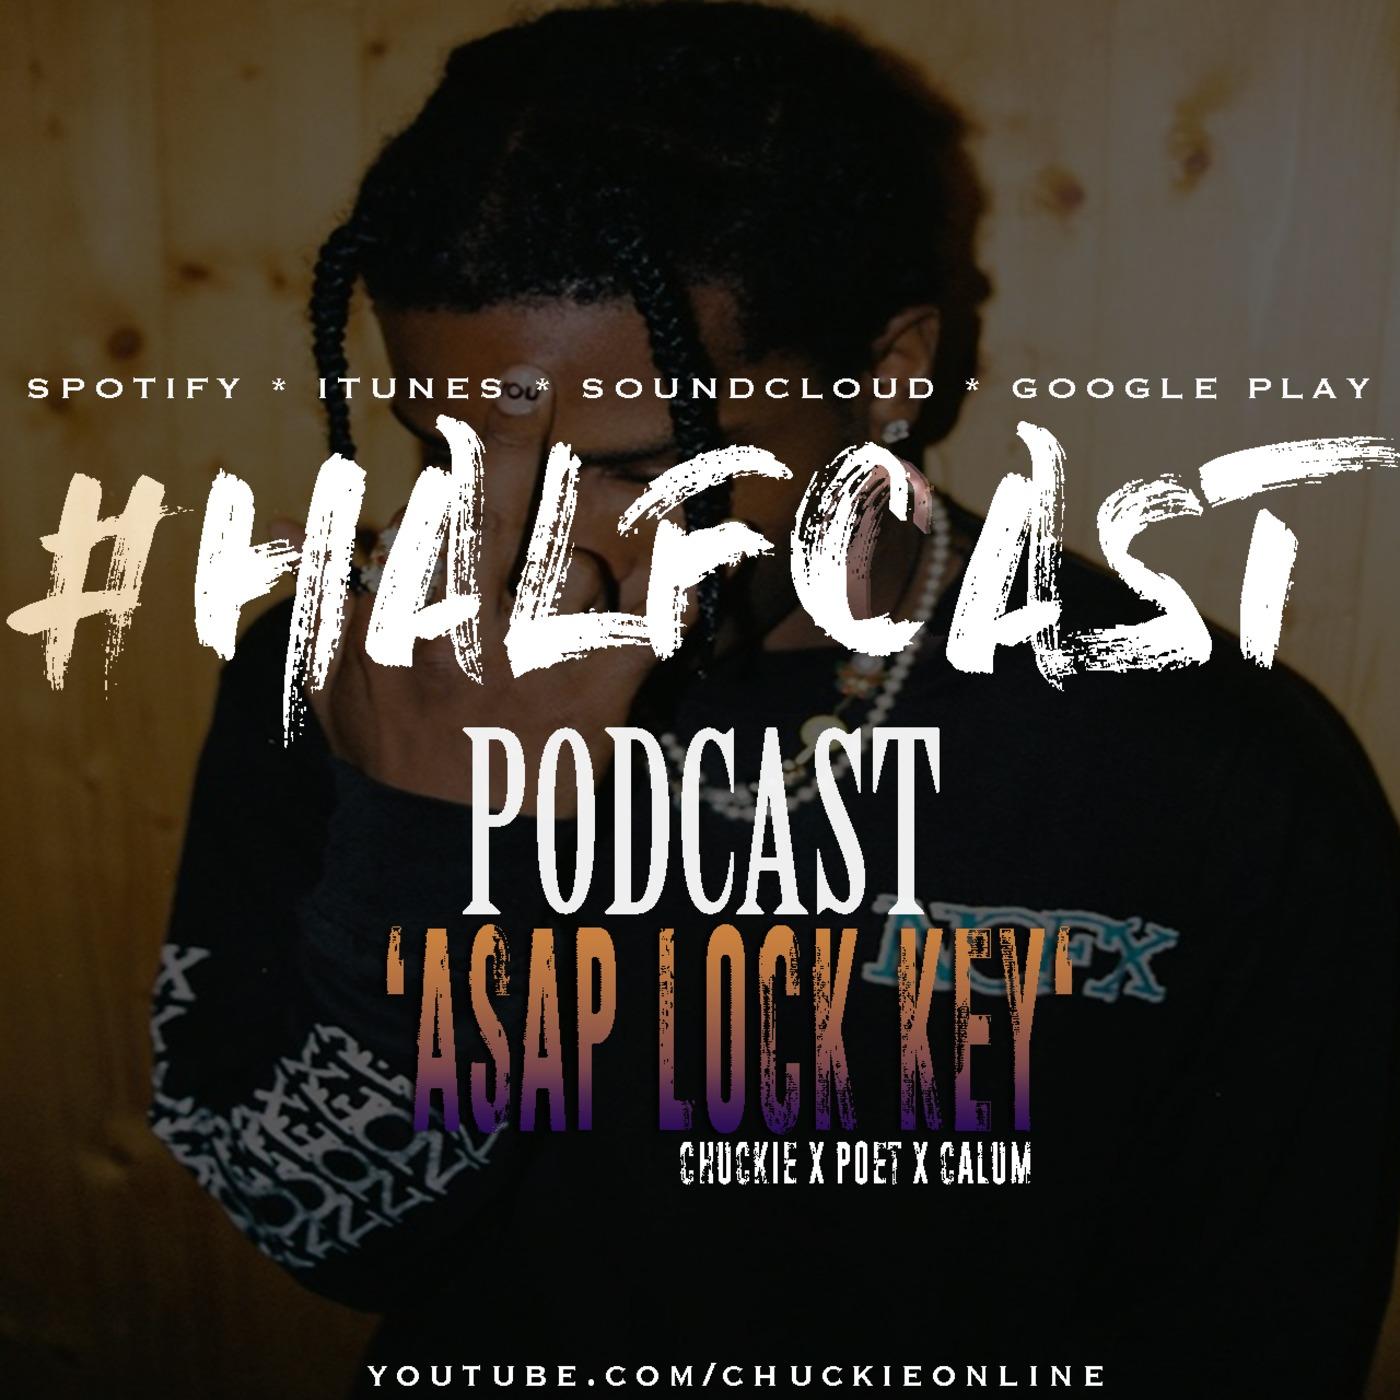 ASAP Lock Key Halfcast podcast